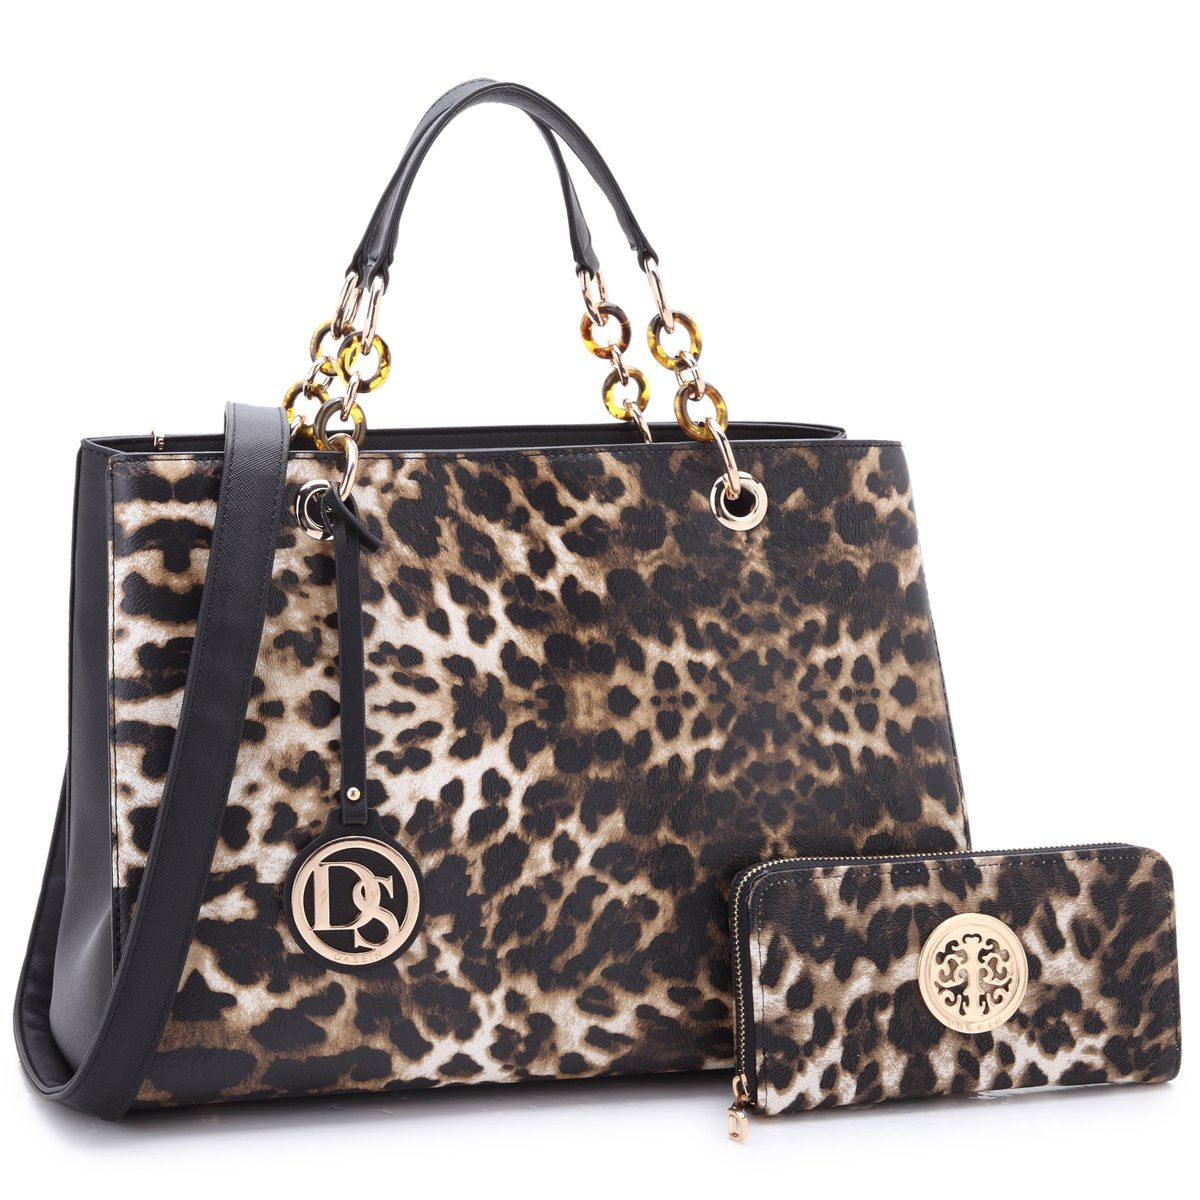 MKP Collection Chain Strap Satchel~Beautiful Handbag with Wallet Set~Designer Purse for Woman. Fashion Purse and Shoulder handbag (2526W) Leopard